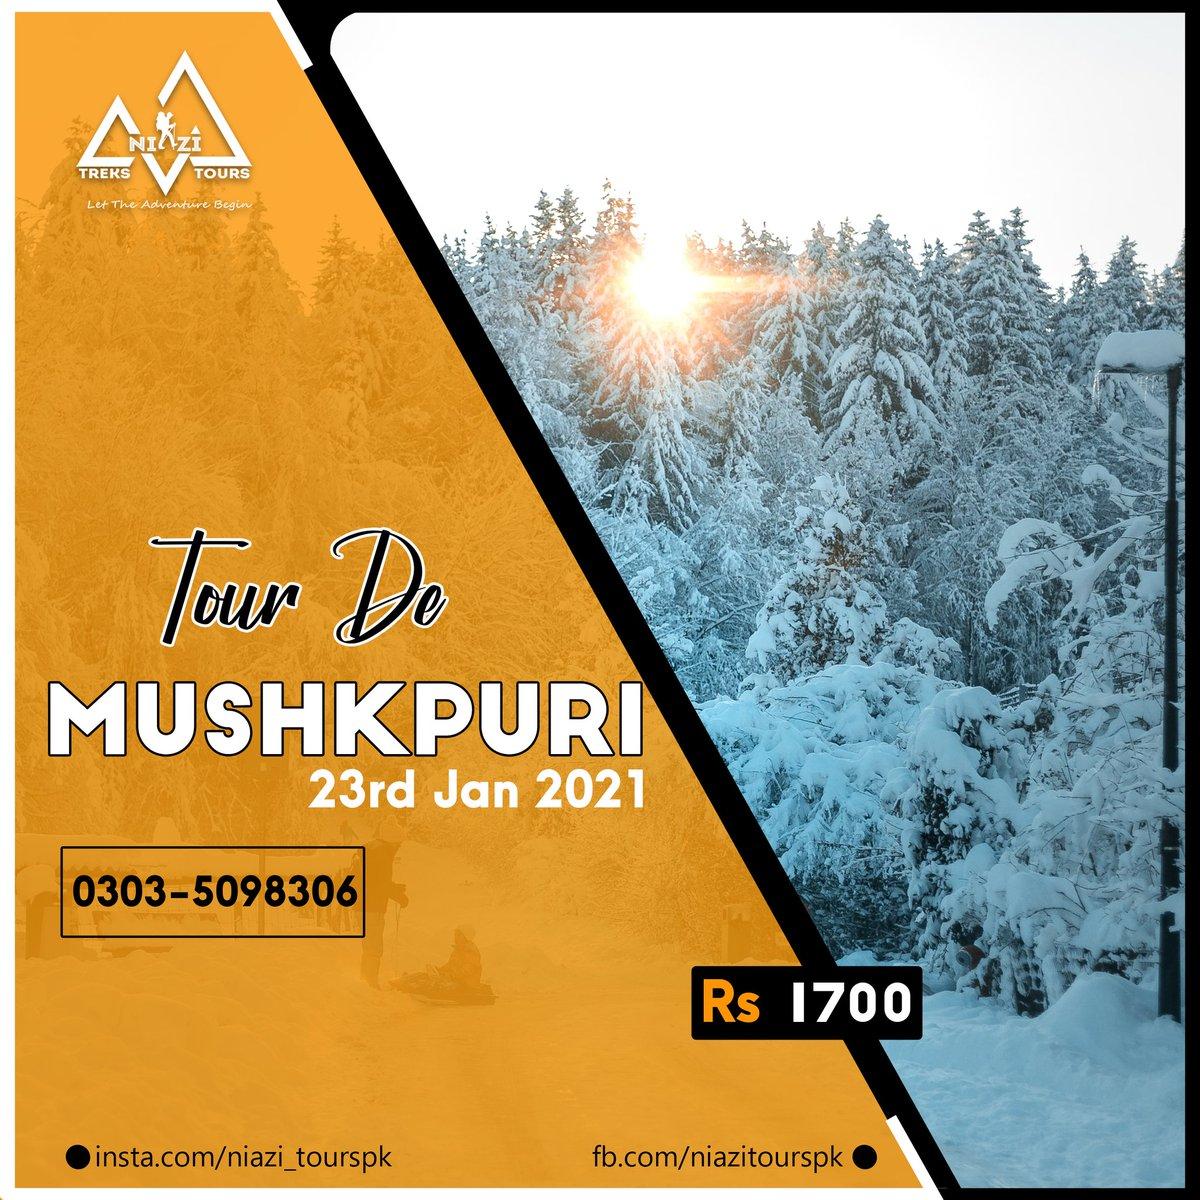 1 Dayer Snowy Trip to Mushkpuri Top.  BOOK NOW.  Charges: 1699 Per Person   Date: 23rd Jan 2021  For Bookings: 03035098306 @niazi_tourspk  #niazitourspk #wednesdaythought  #ARYNews #K2winter2021  #StayTuned #Pakistan  #tourism #Mushkpuri  #Mushkpuritop